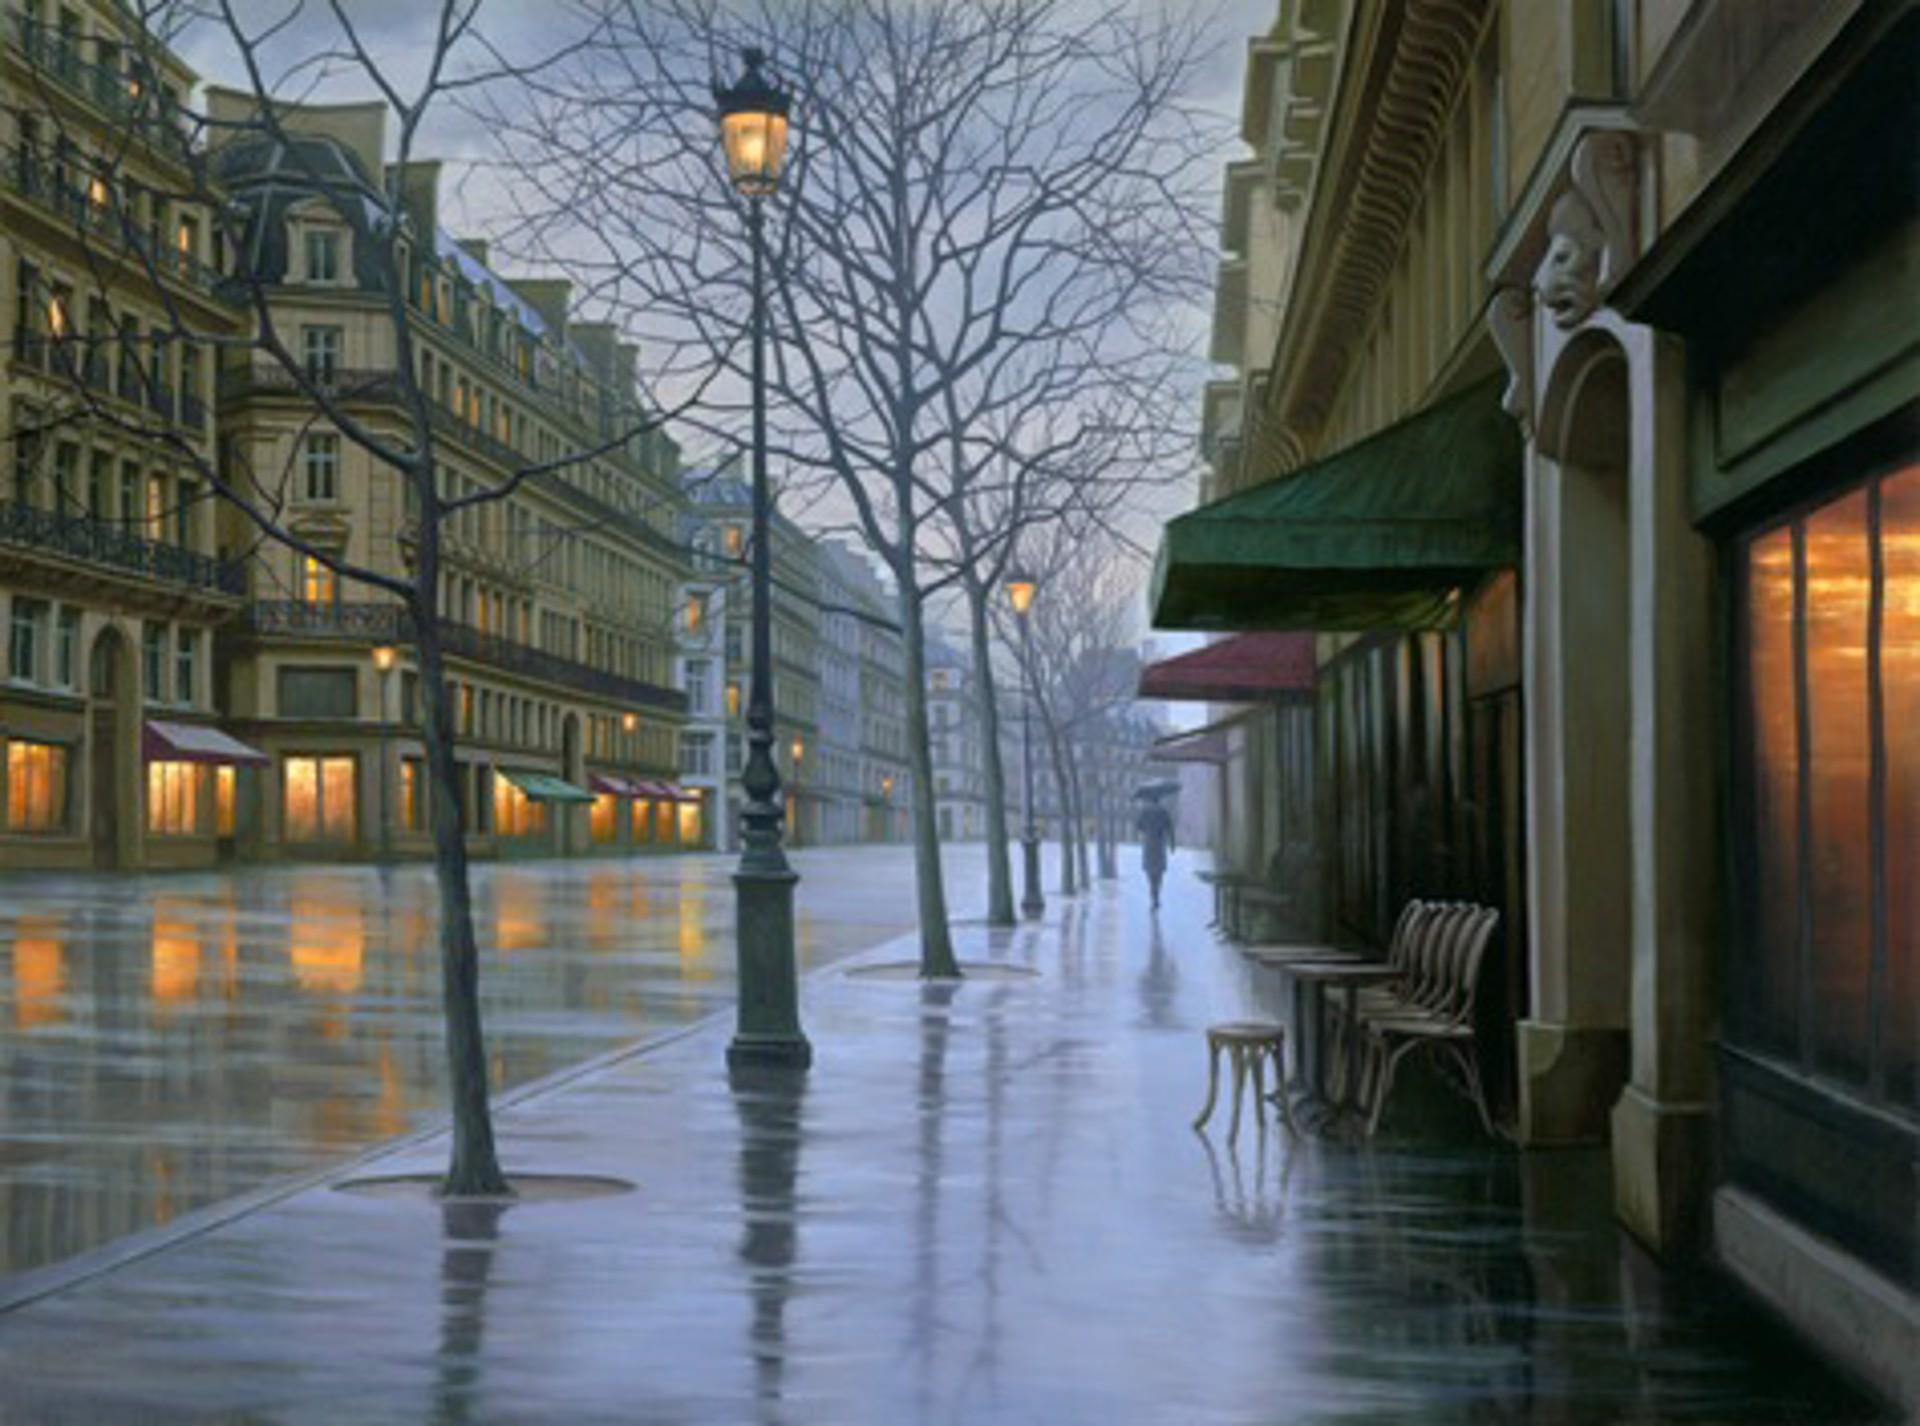 Rue de Louvre by Alexei Butirskiy